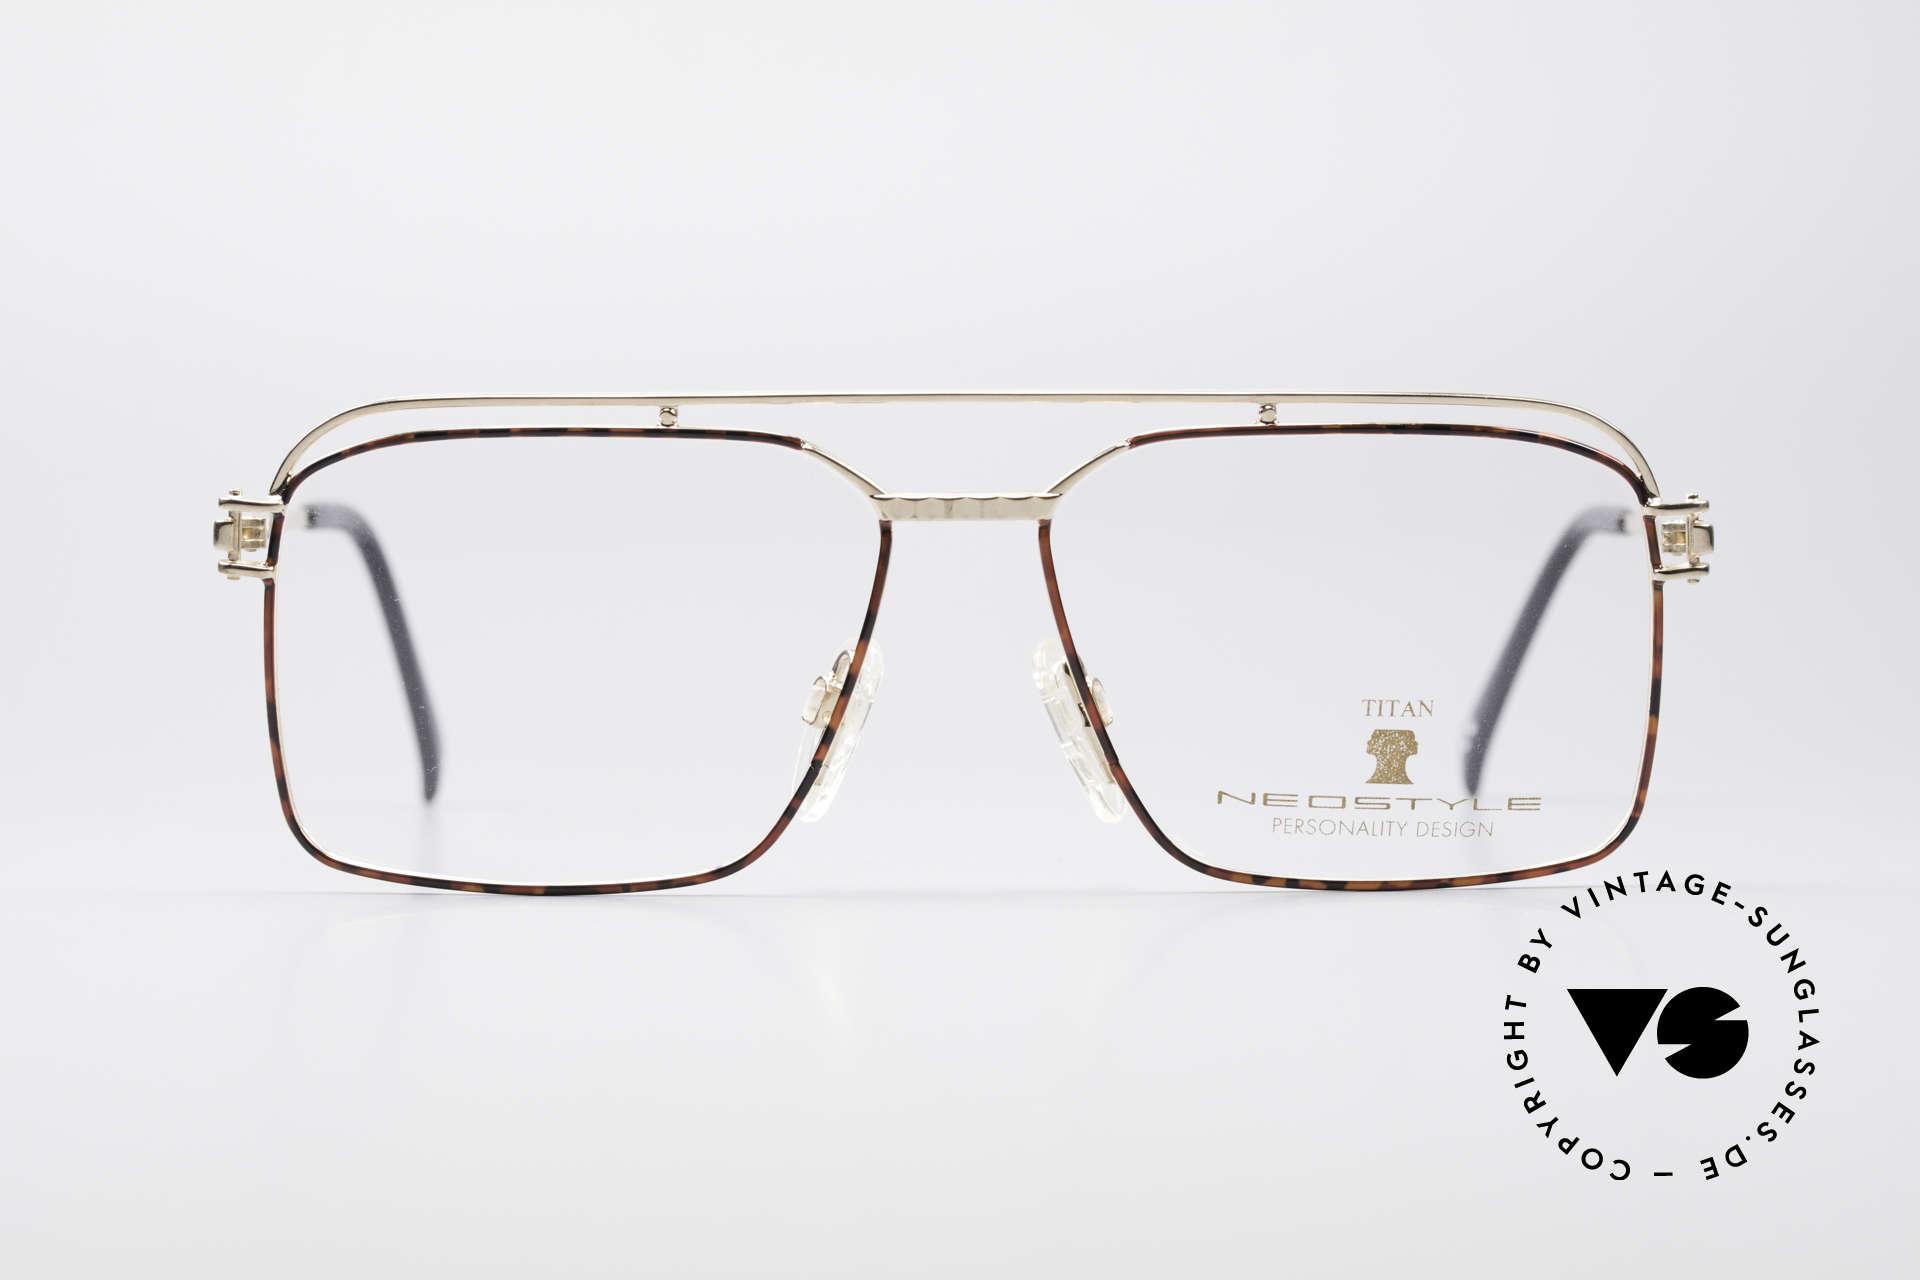 fad11217bb Glasses Neostyle Dynaty 424 - L 80 s Titanium Men s Frame